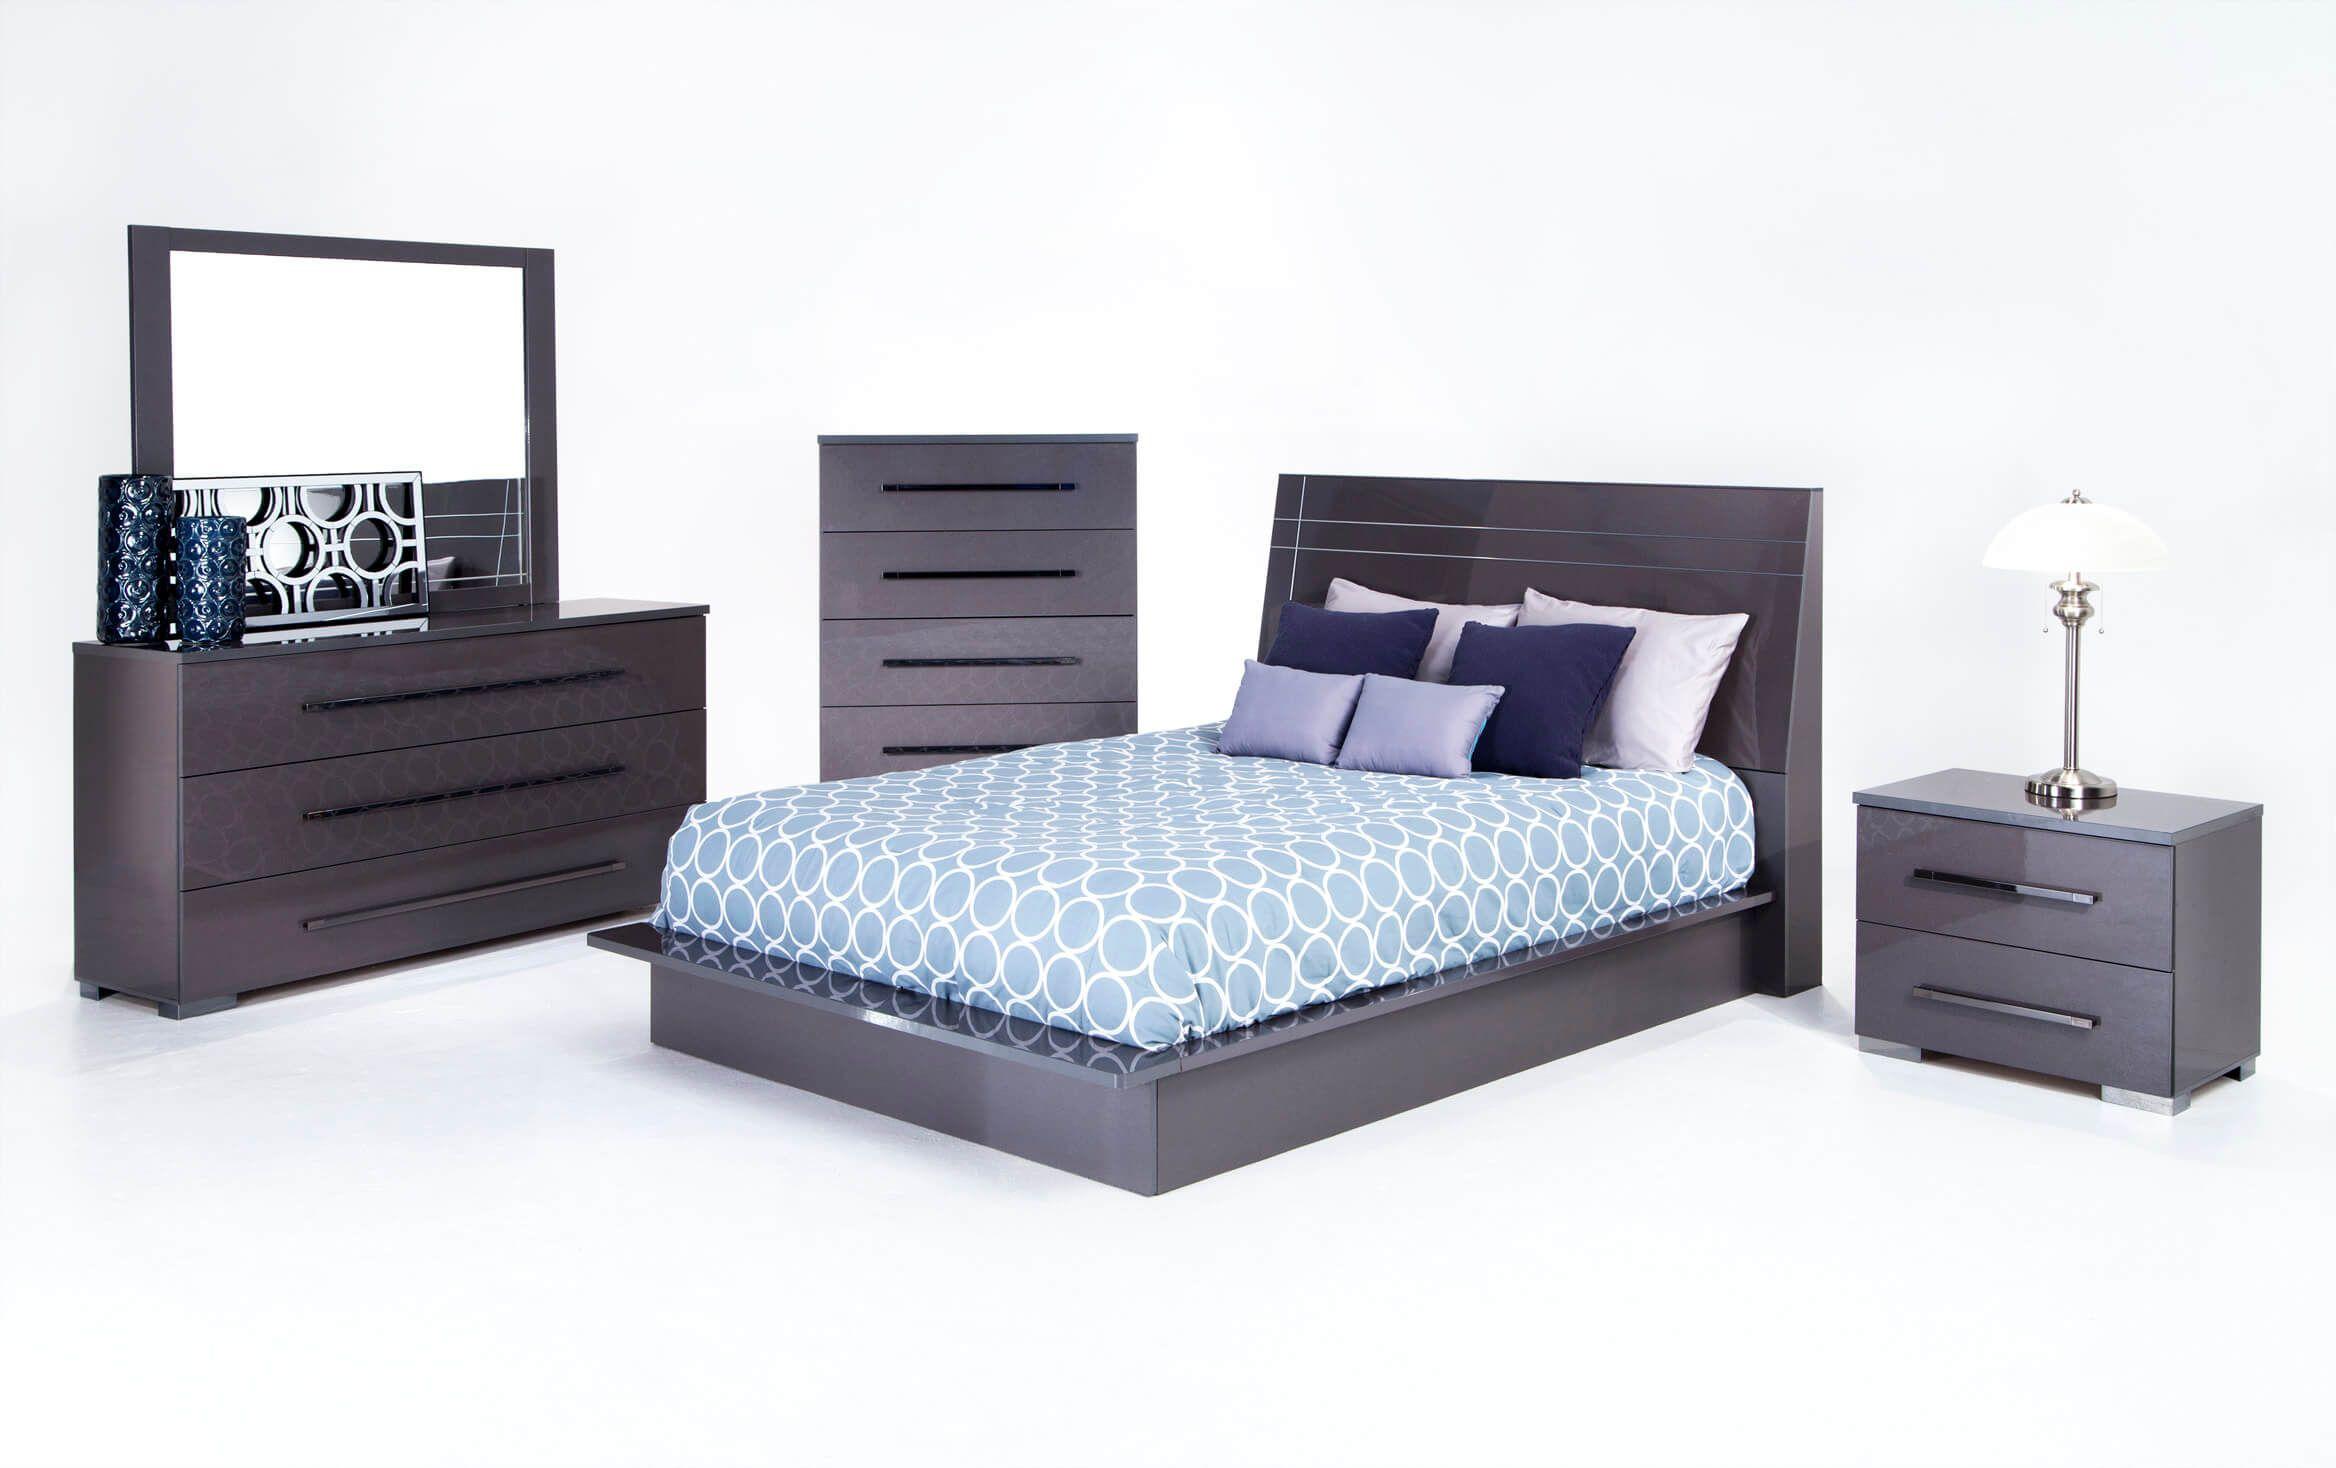 Platinum Bedroom Set Platinum bedroom, Bedroom furniture